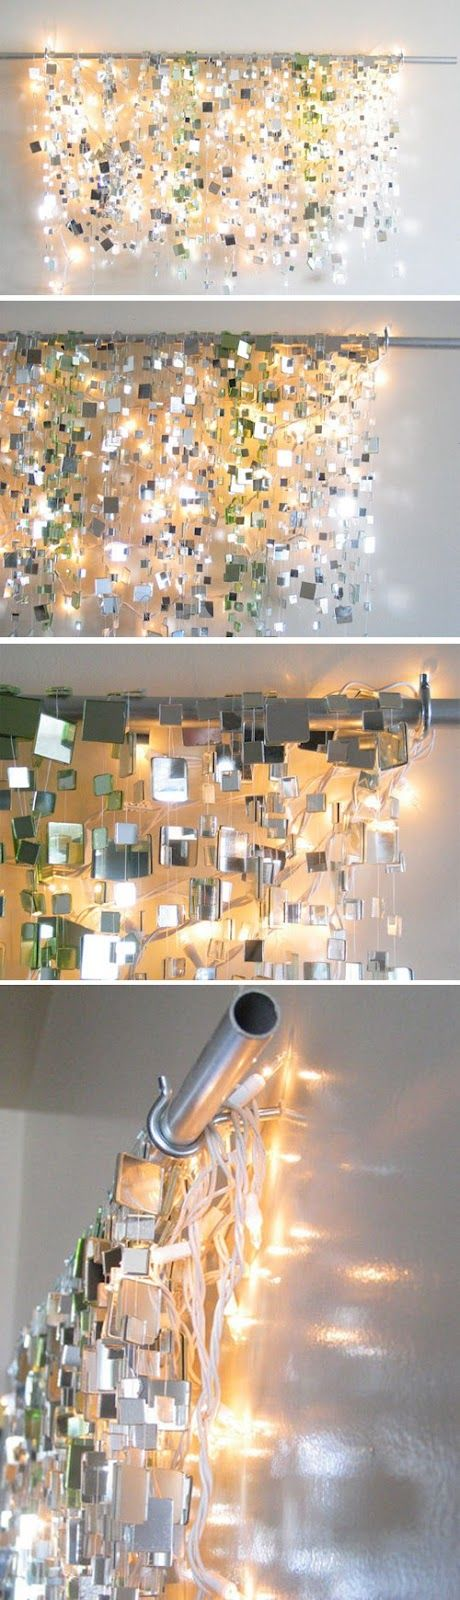 Diy: cortina de espejos iluminada : x4duros.com